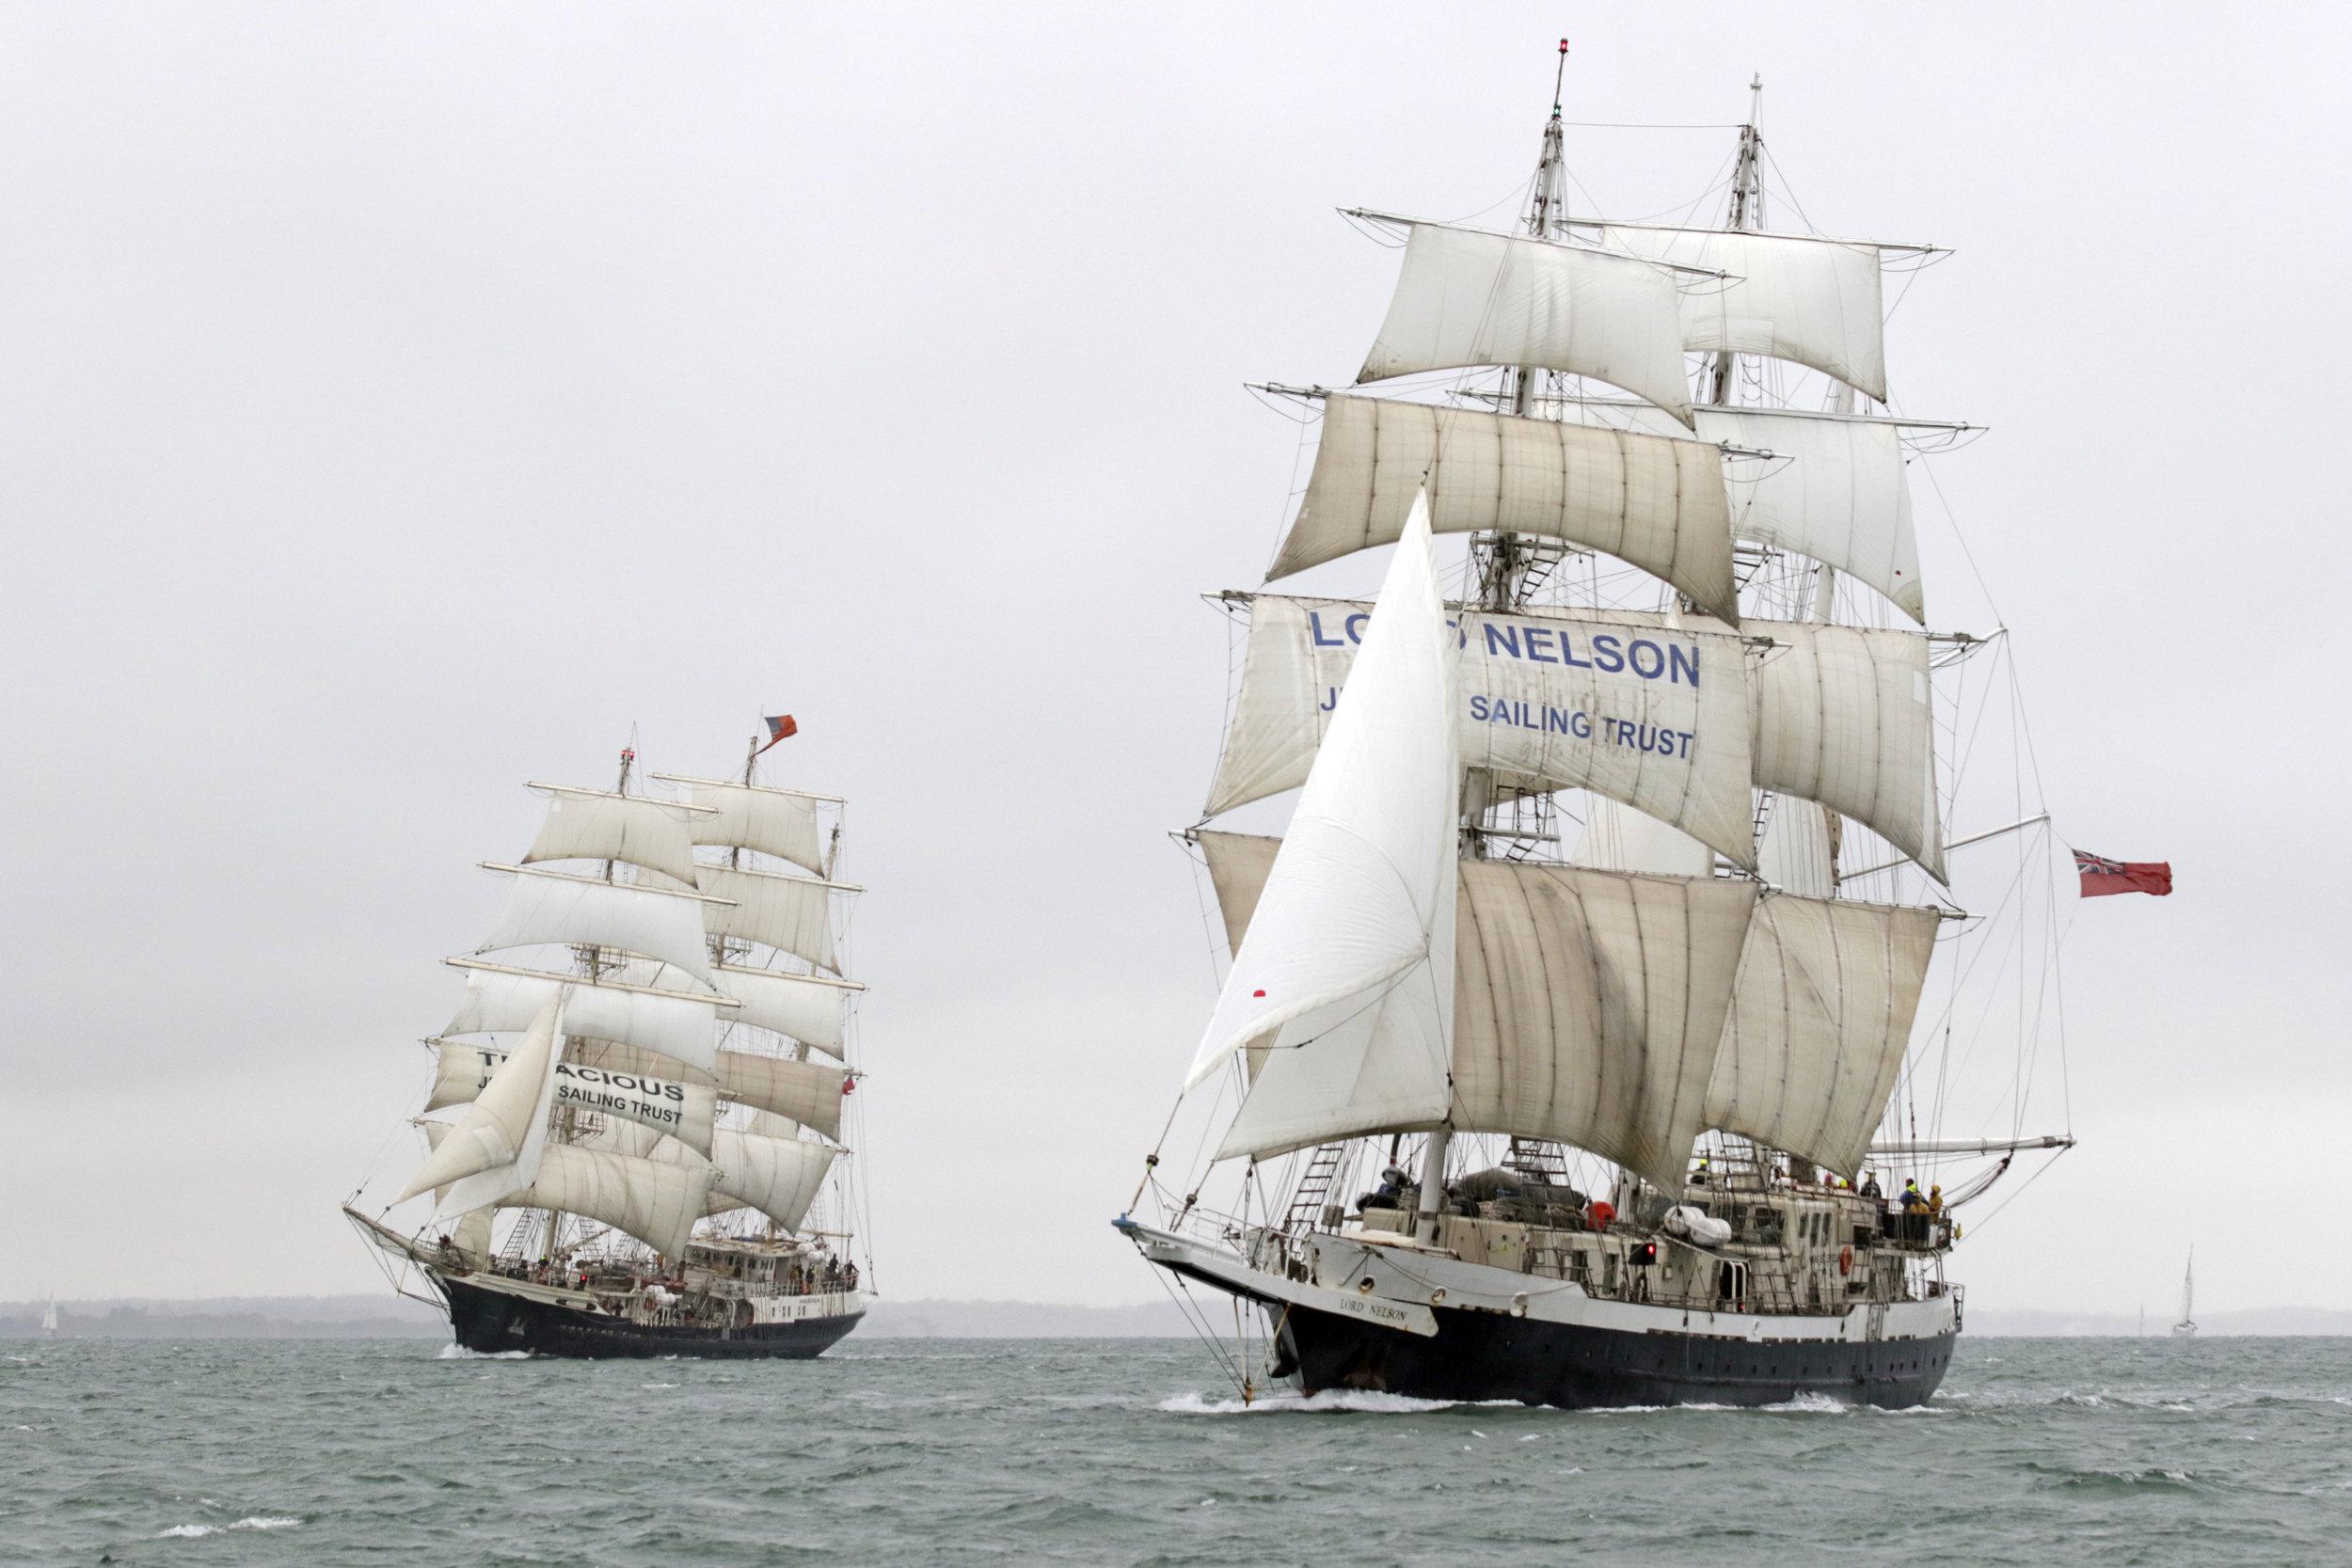 TNS & LN ASTO Small Ships race Cowes 2018.JPG